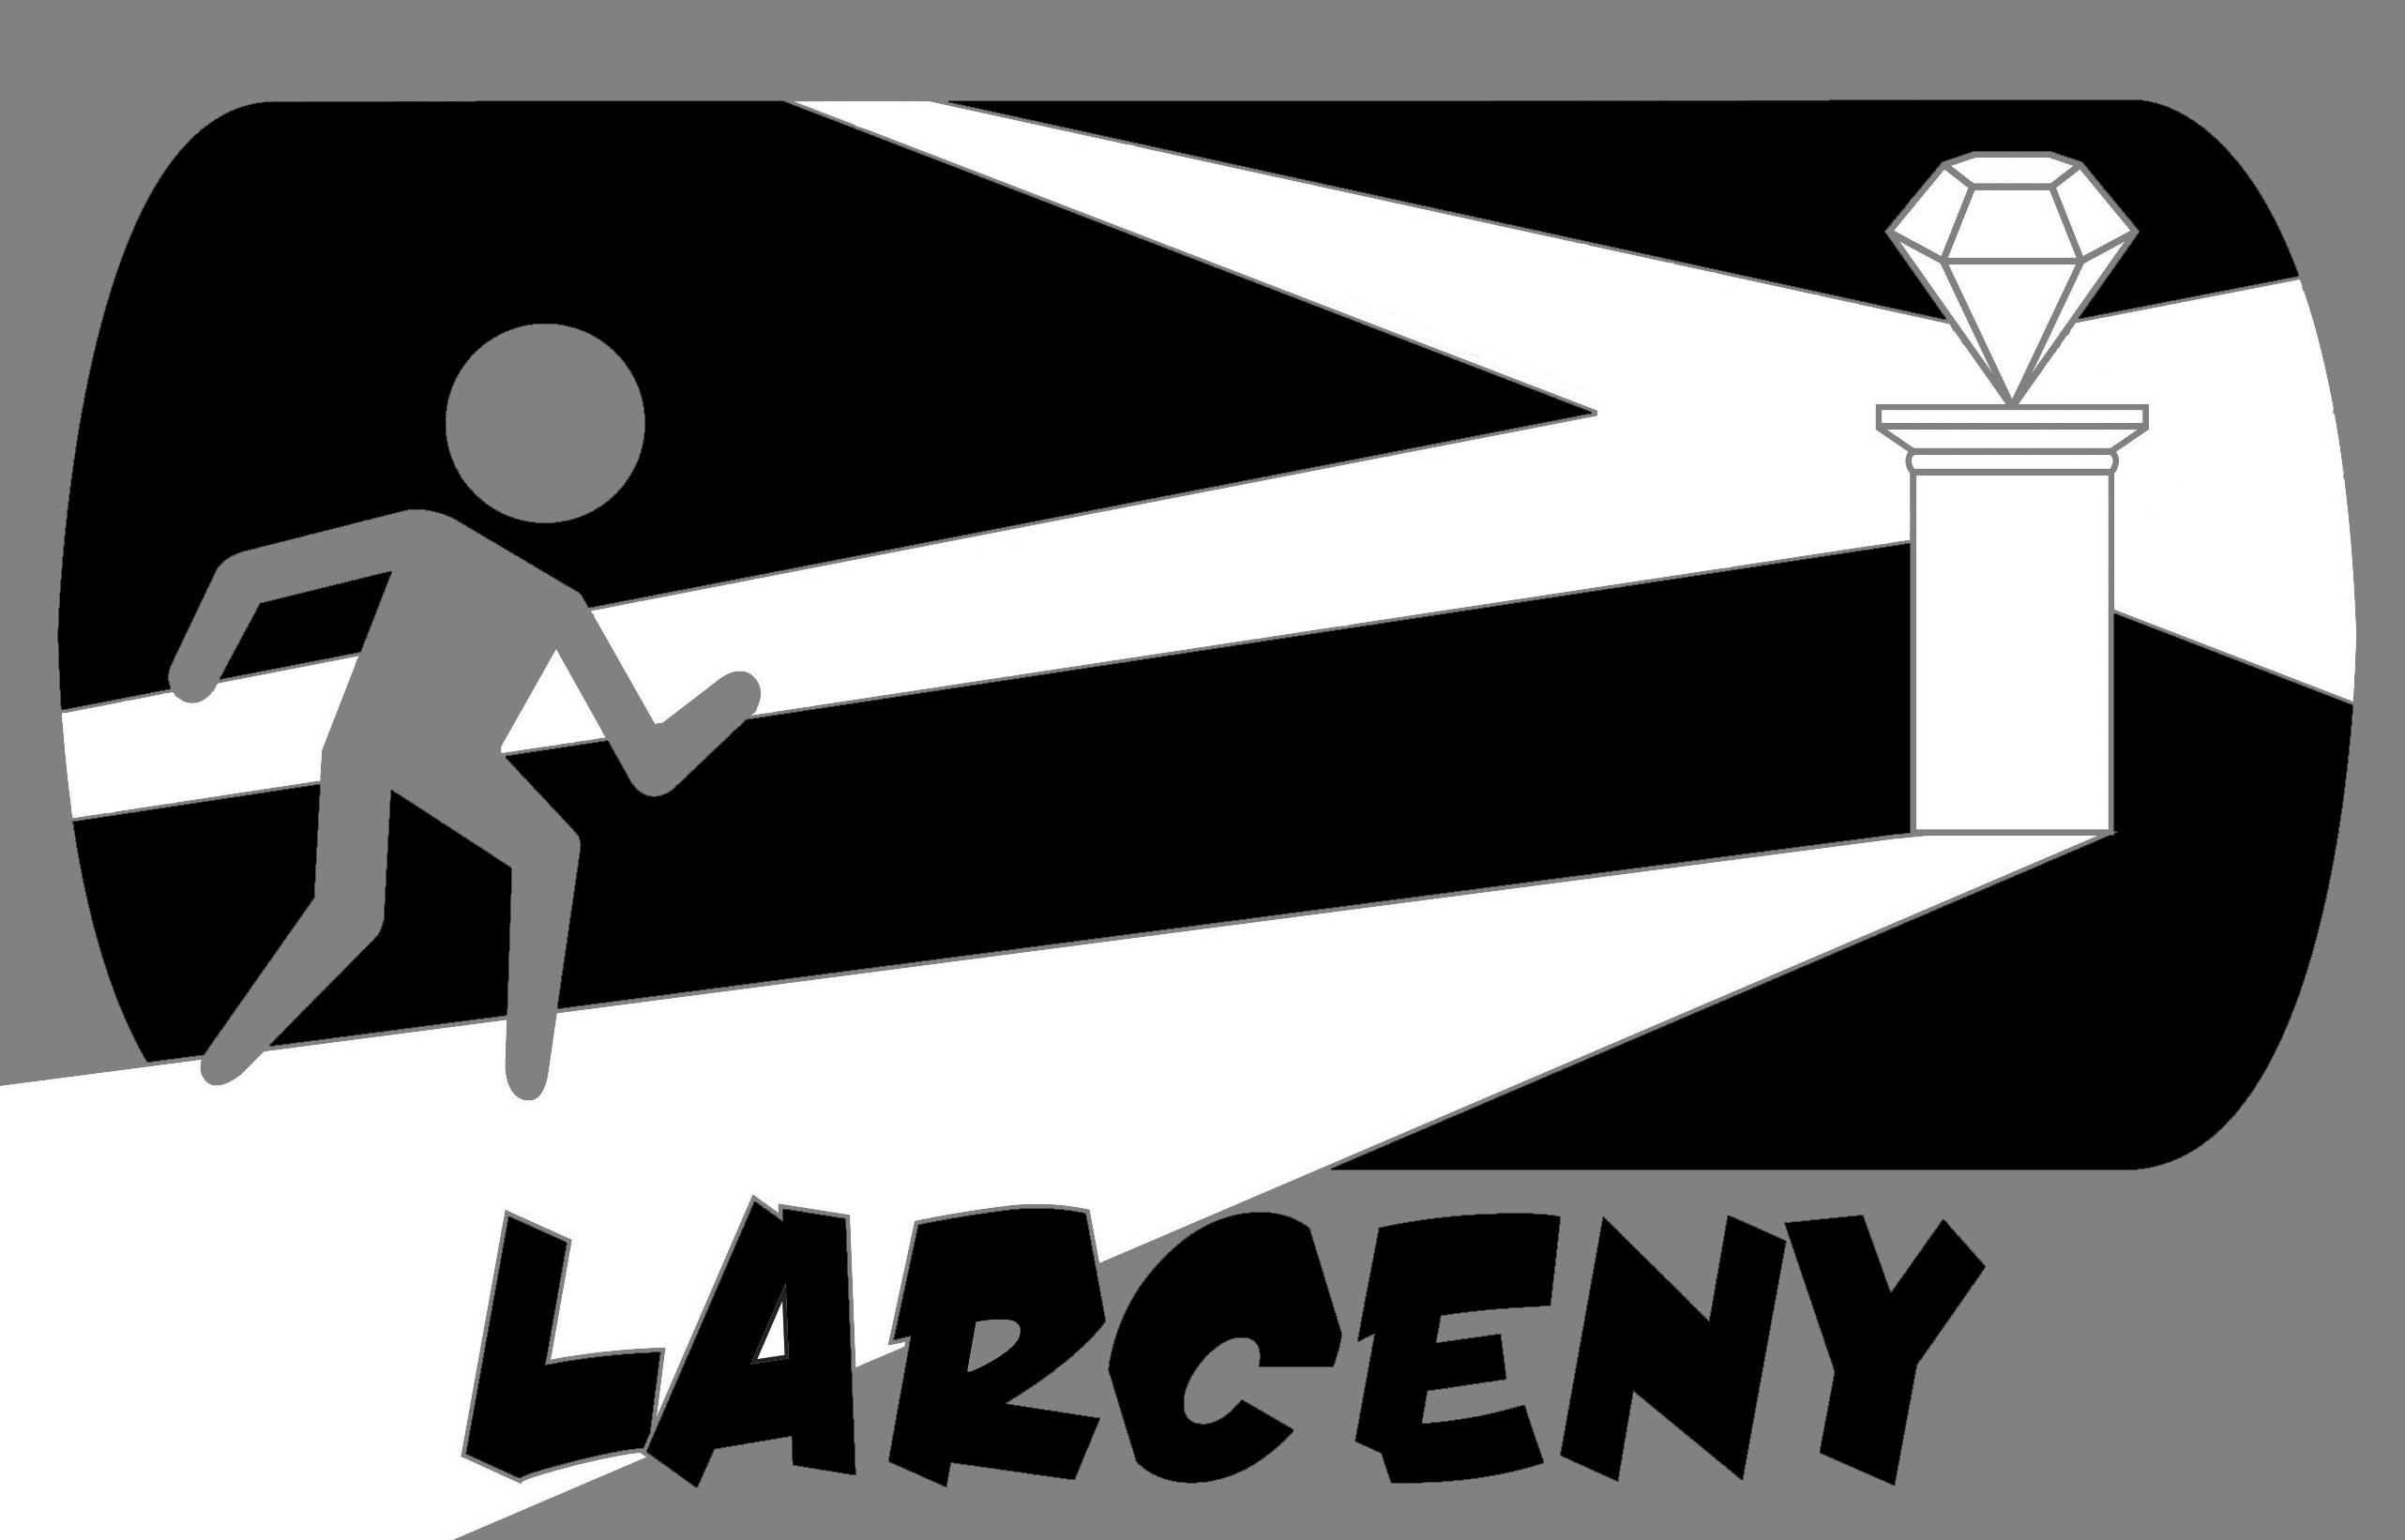 Larceny Of Personal Property